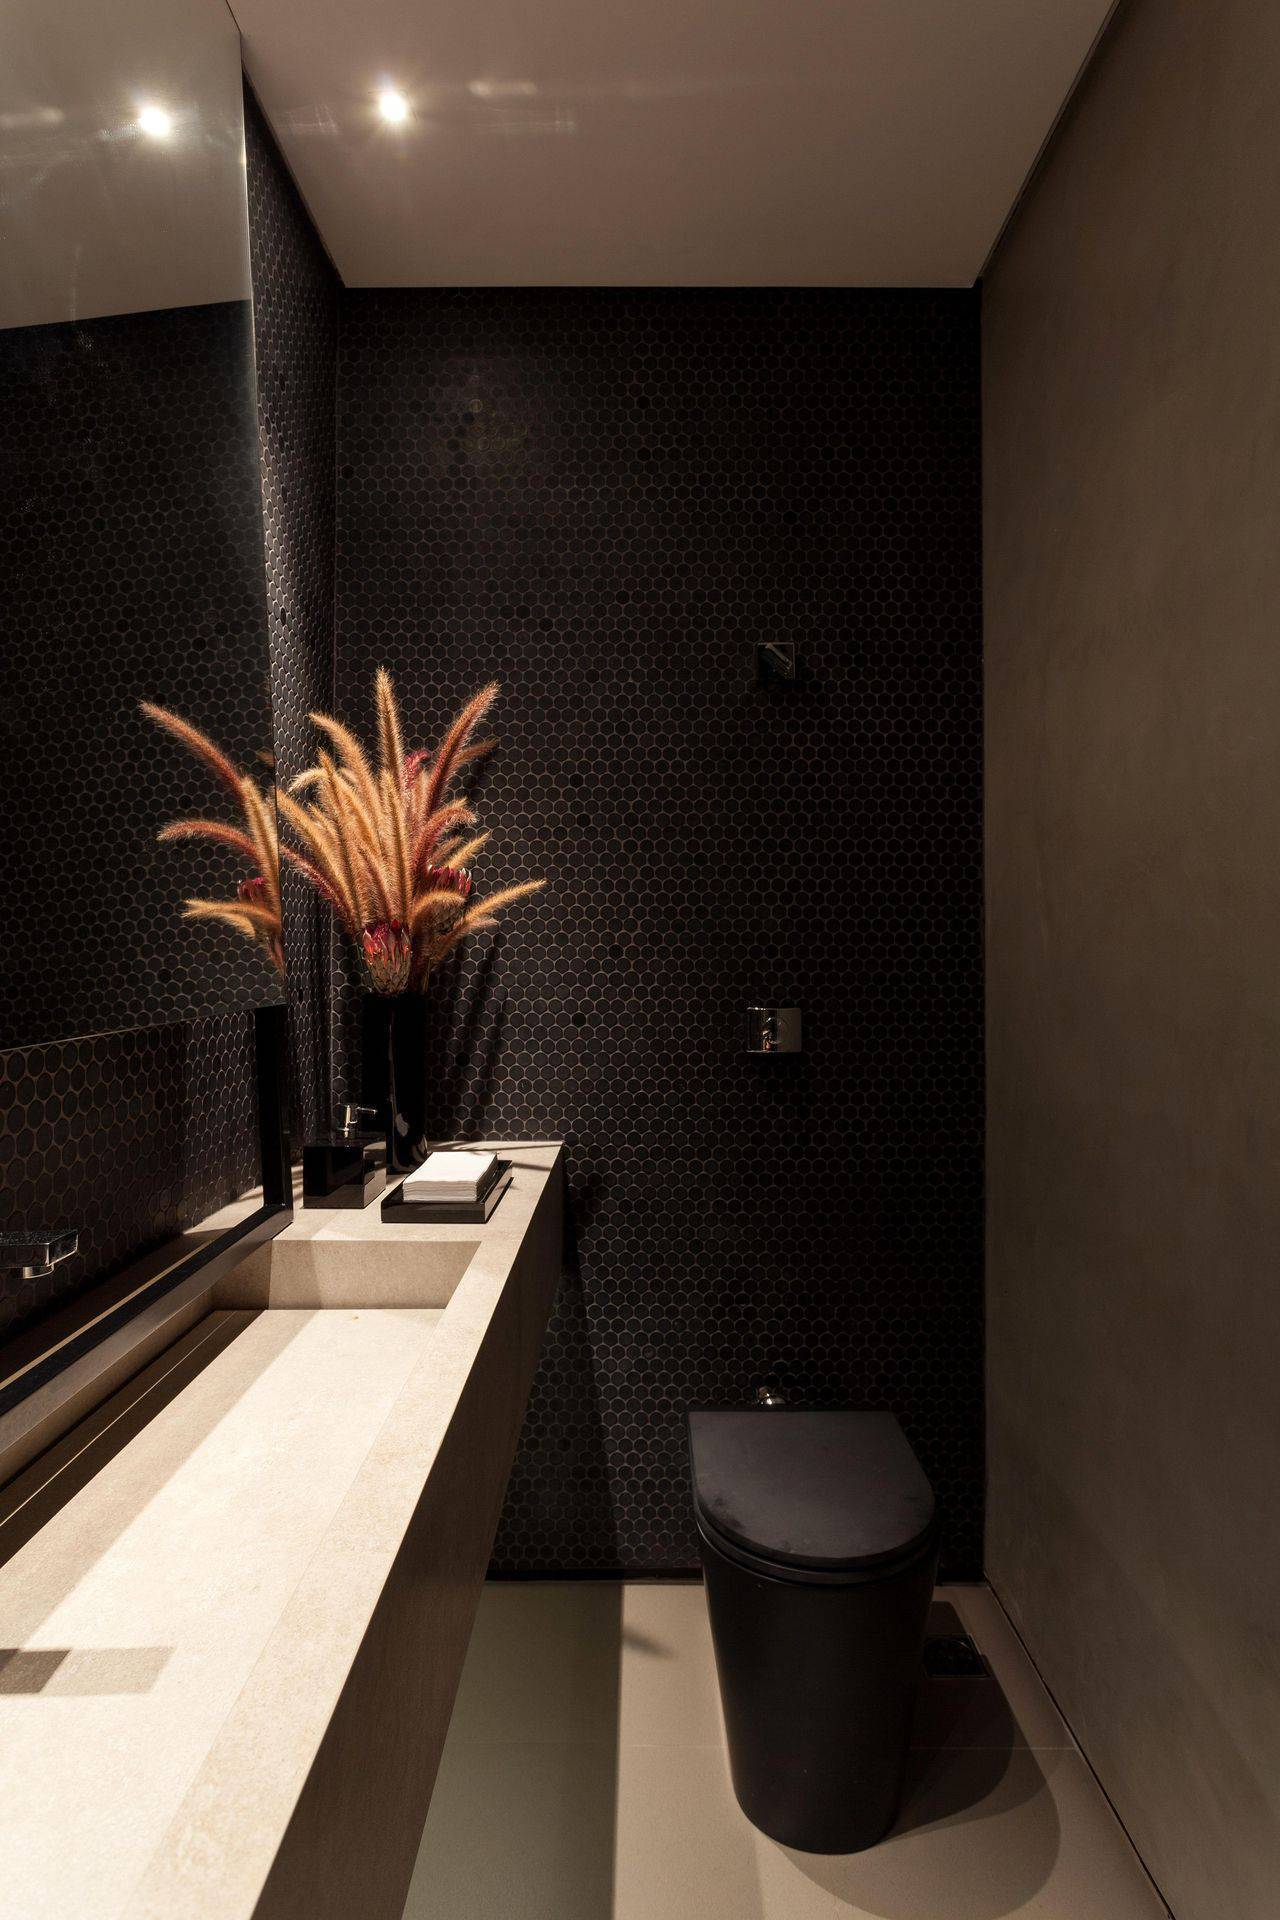 vaso sanitario banheiro consuelo jorge 84793